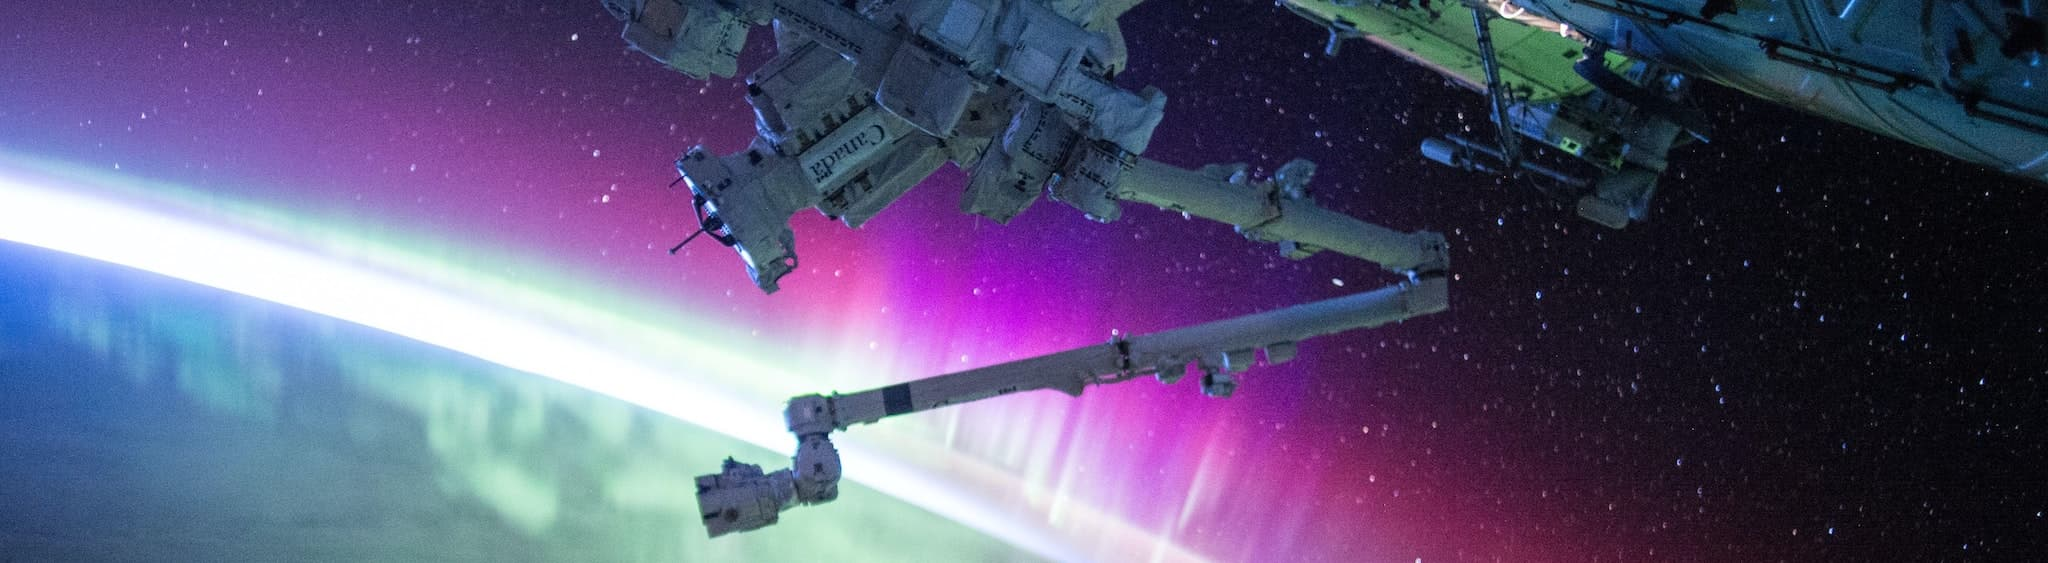 Space Exploration Week Banner